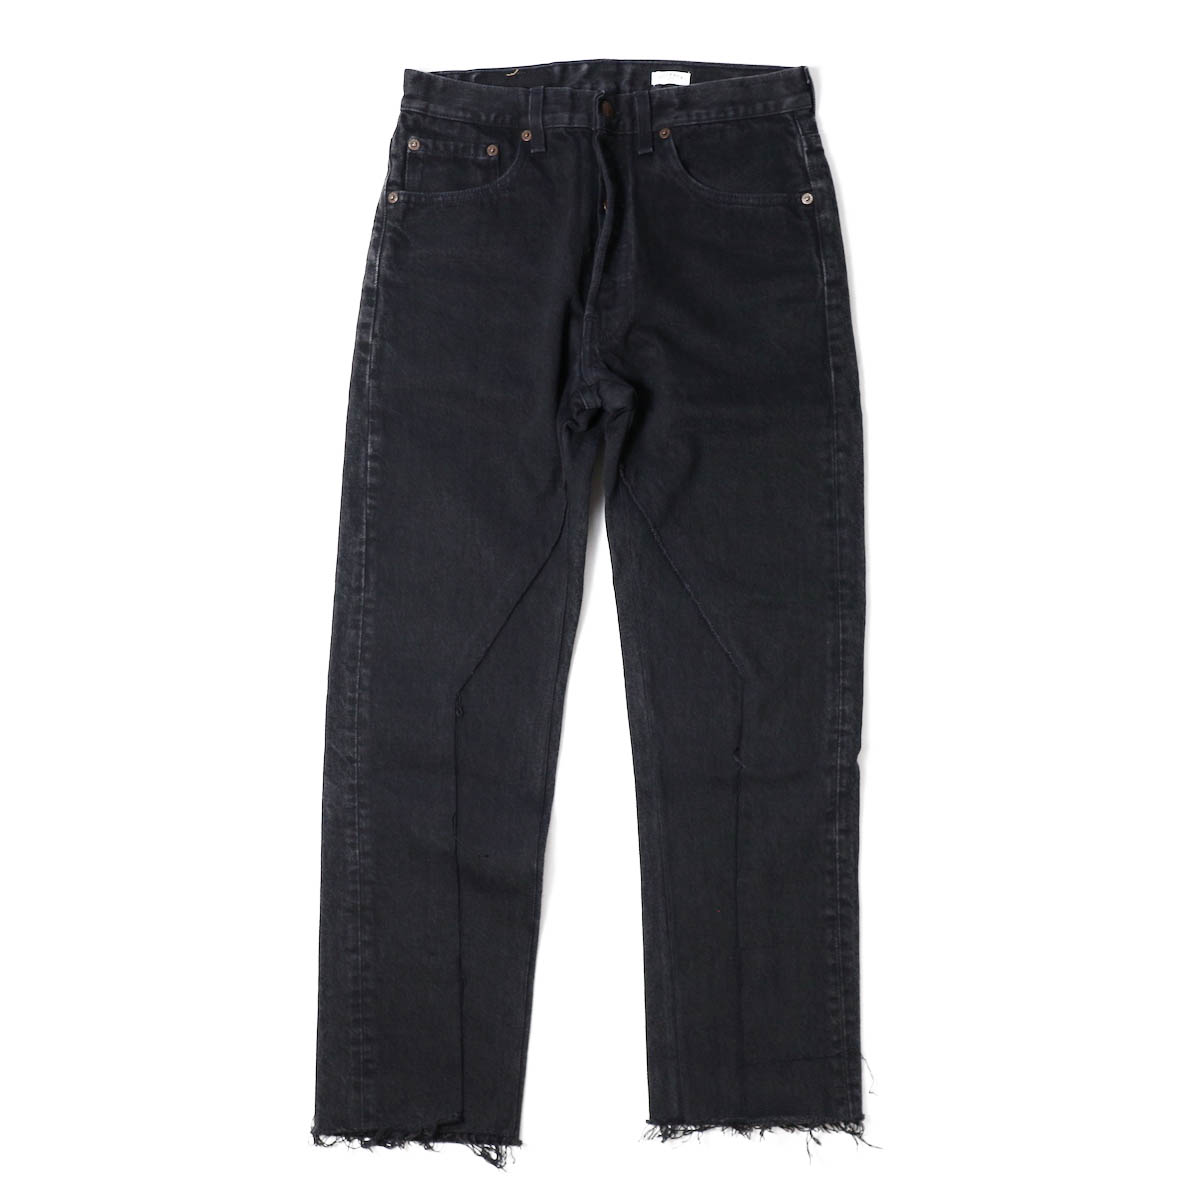 OLD PARK / SLIT JEANS BLACK Ssize -(G)